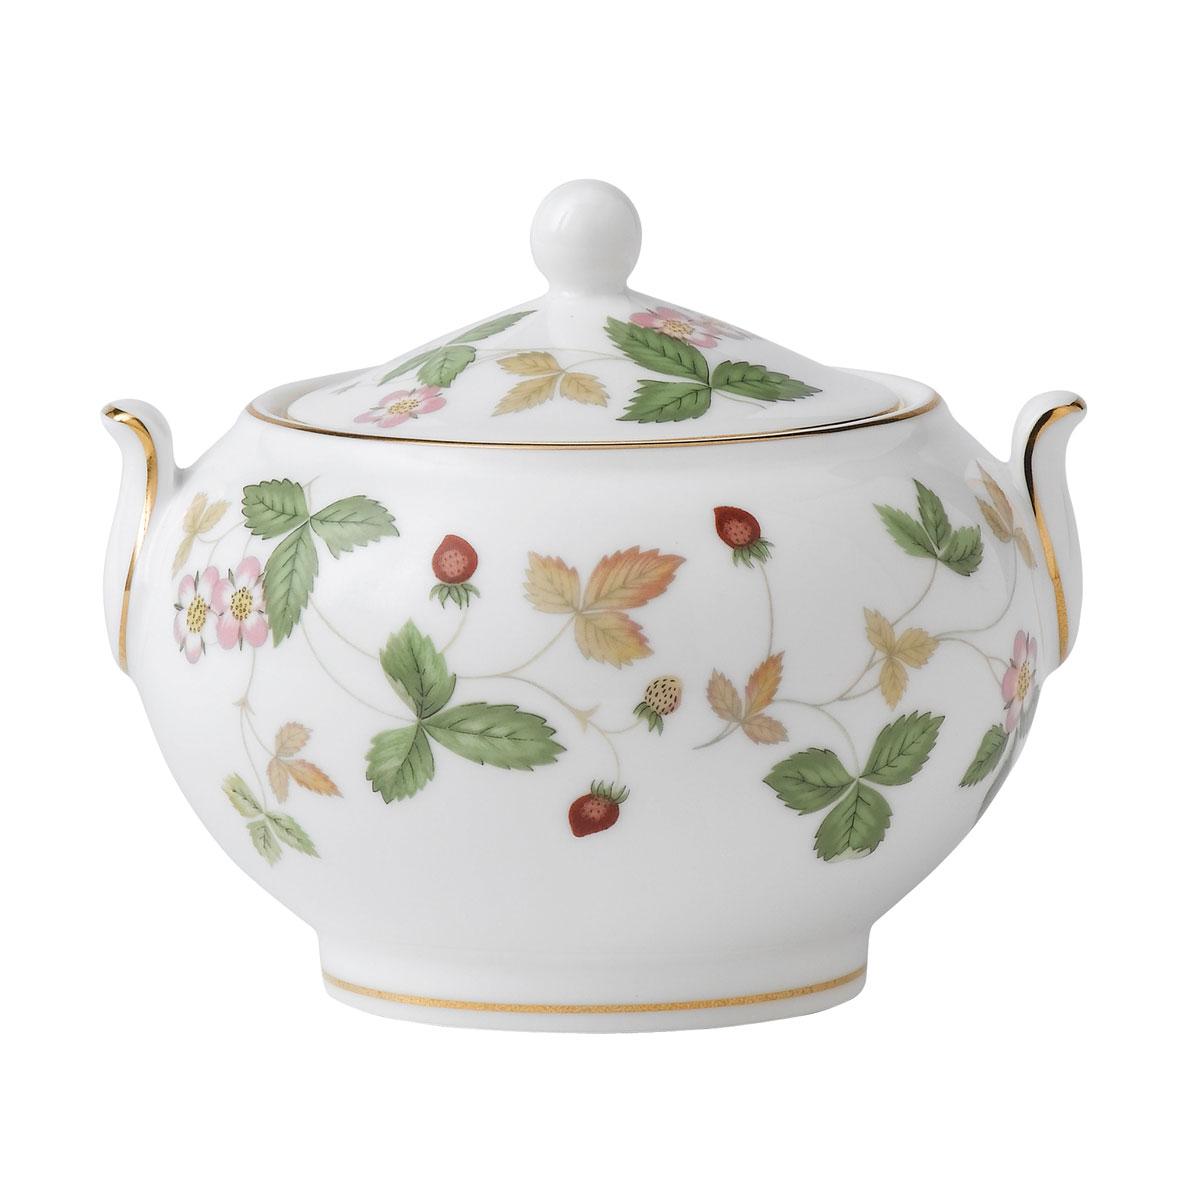 Wedgwood Wild Strawberry Covered Sugar Bowl